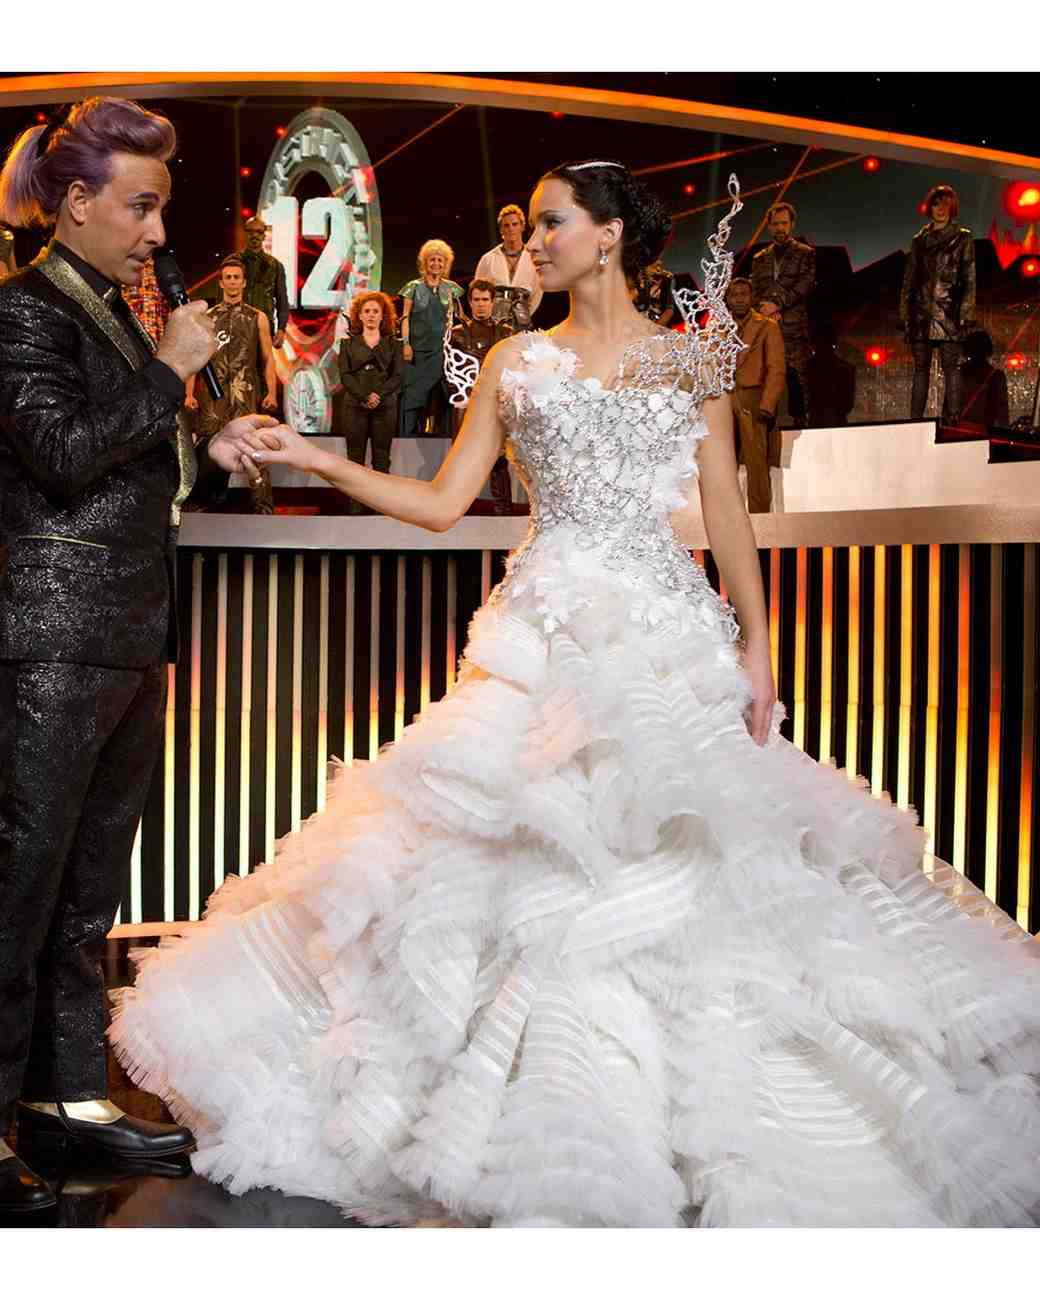 movie-wedding-dresses-hunger-games-catching-fire-mockingjay-dress-jennifer-lawrence-0316.jpg